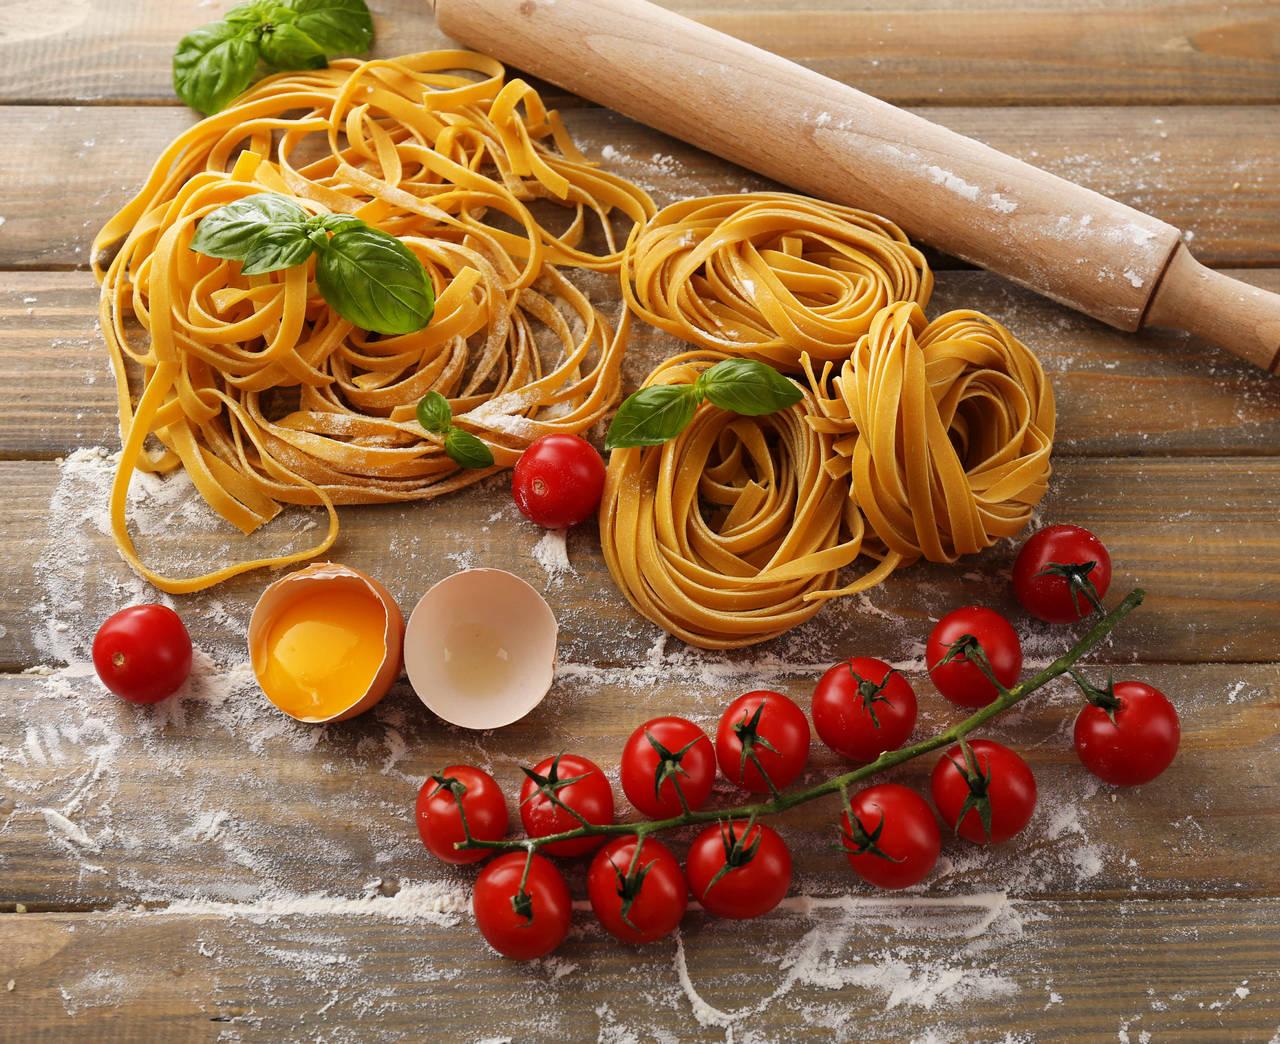 La dieta mediterranea cucina naturale - La mediterranea ...